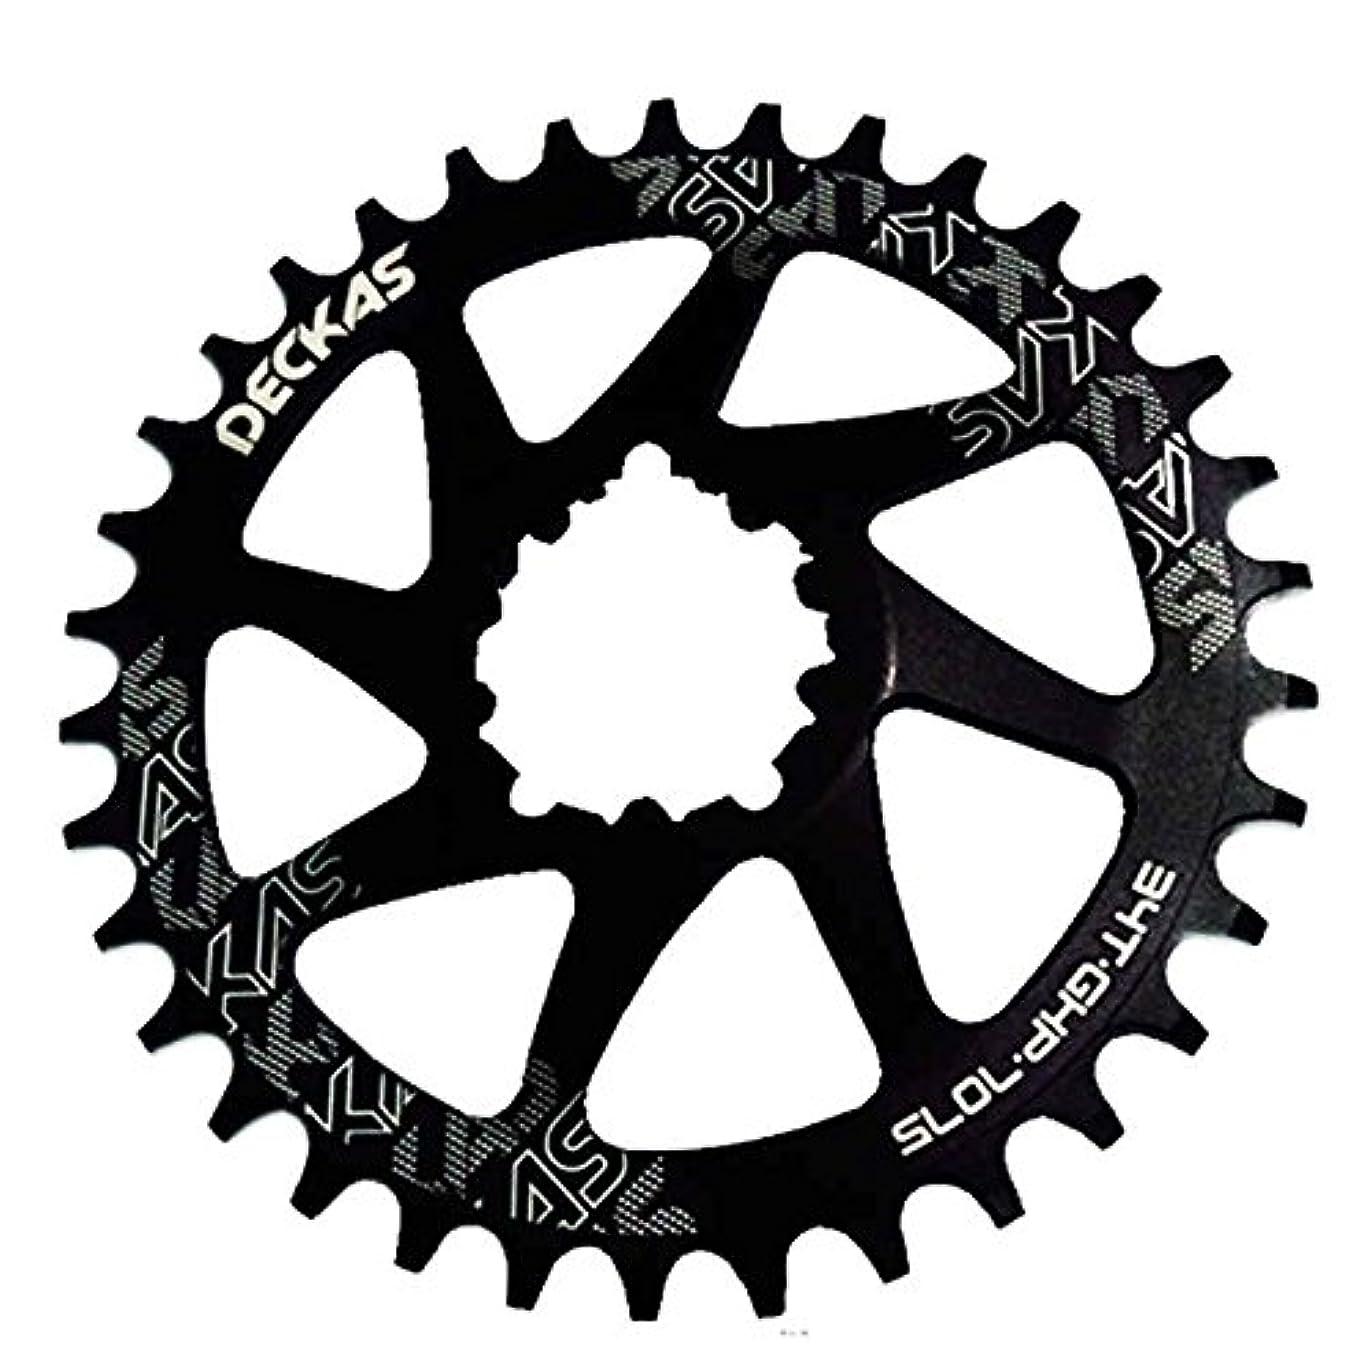 Propenary - GXP bicycle crankset Al 7075 CNC32T 34T Narrow Wide Chainring Chainwheel for Sram XX1 XO1 X1 GX XO X9 crankset bicycle parts [ 34T Black ]